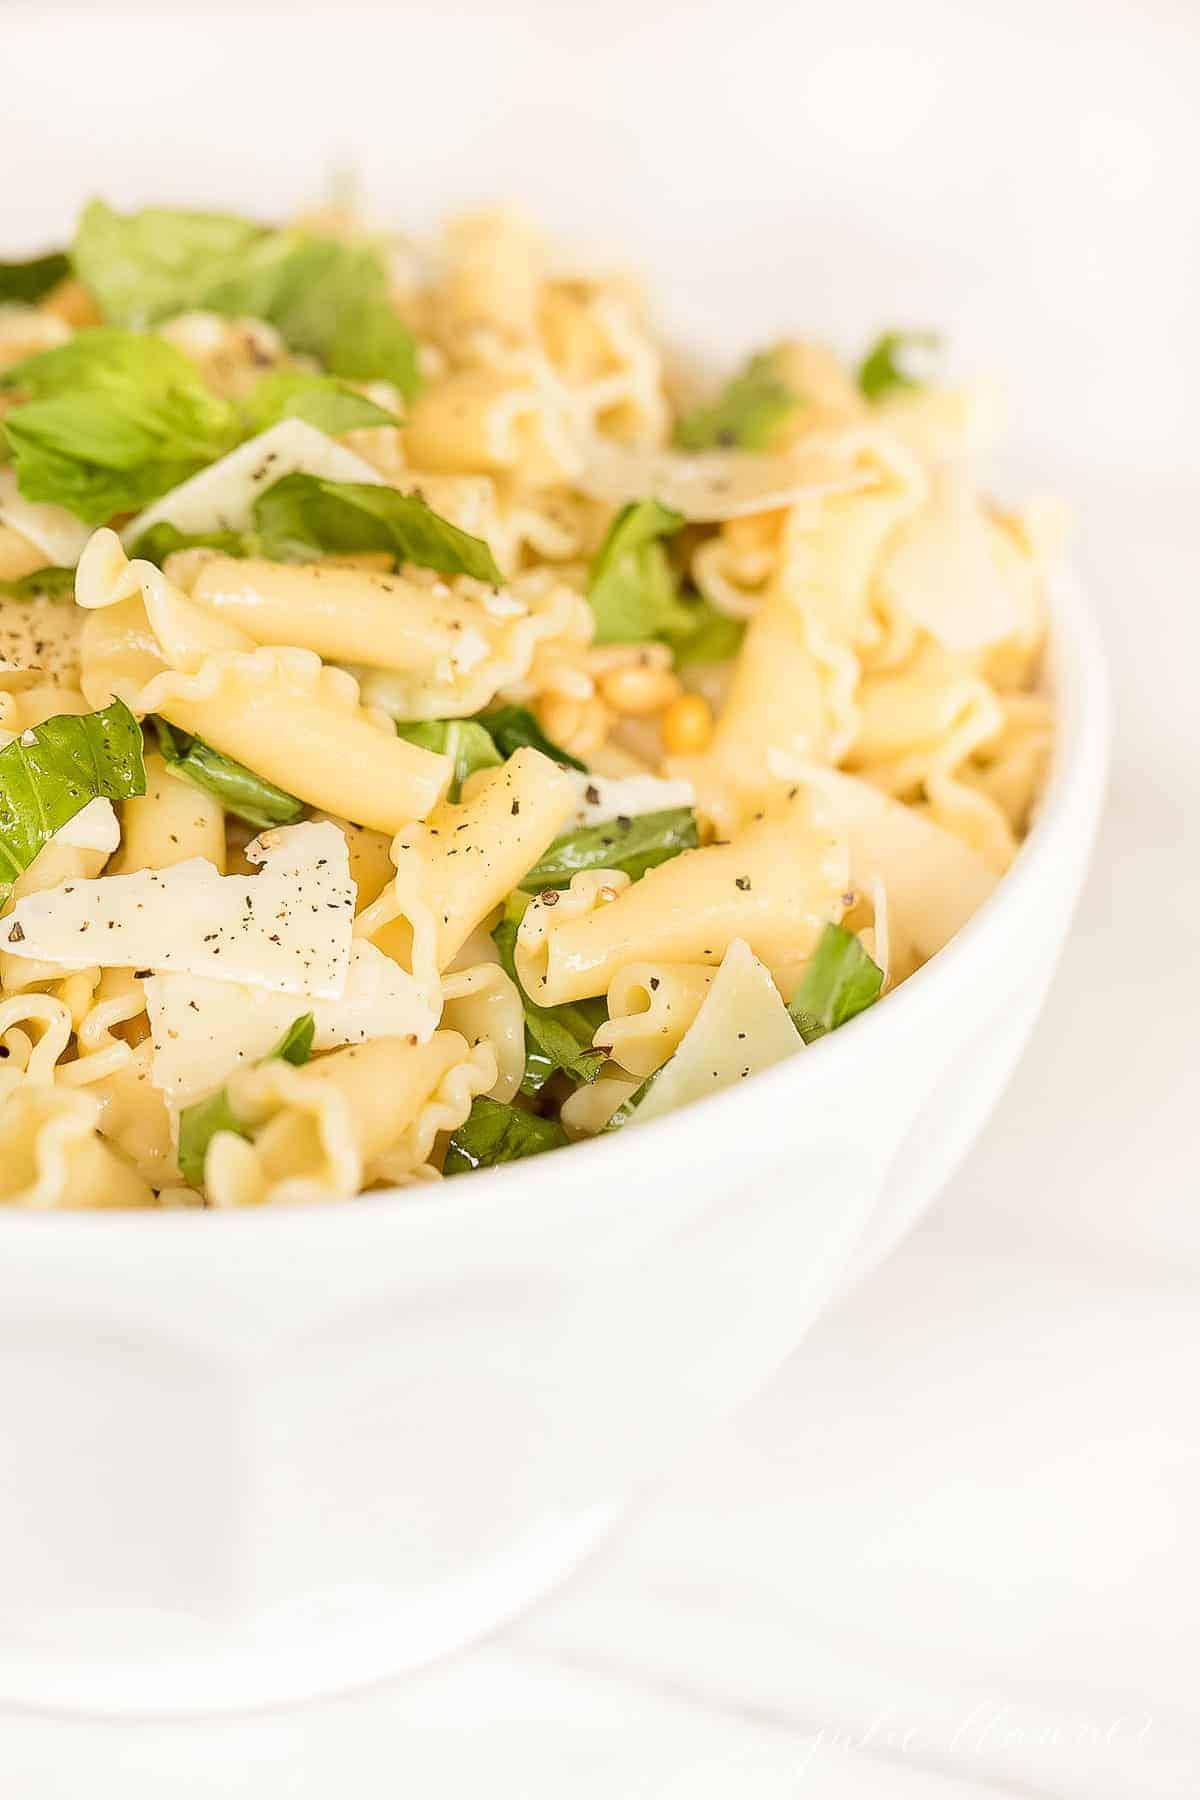 lemon basil pasta salad in white bowl